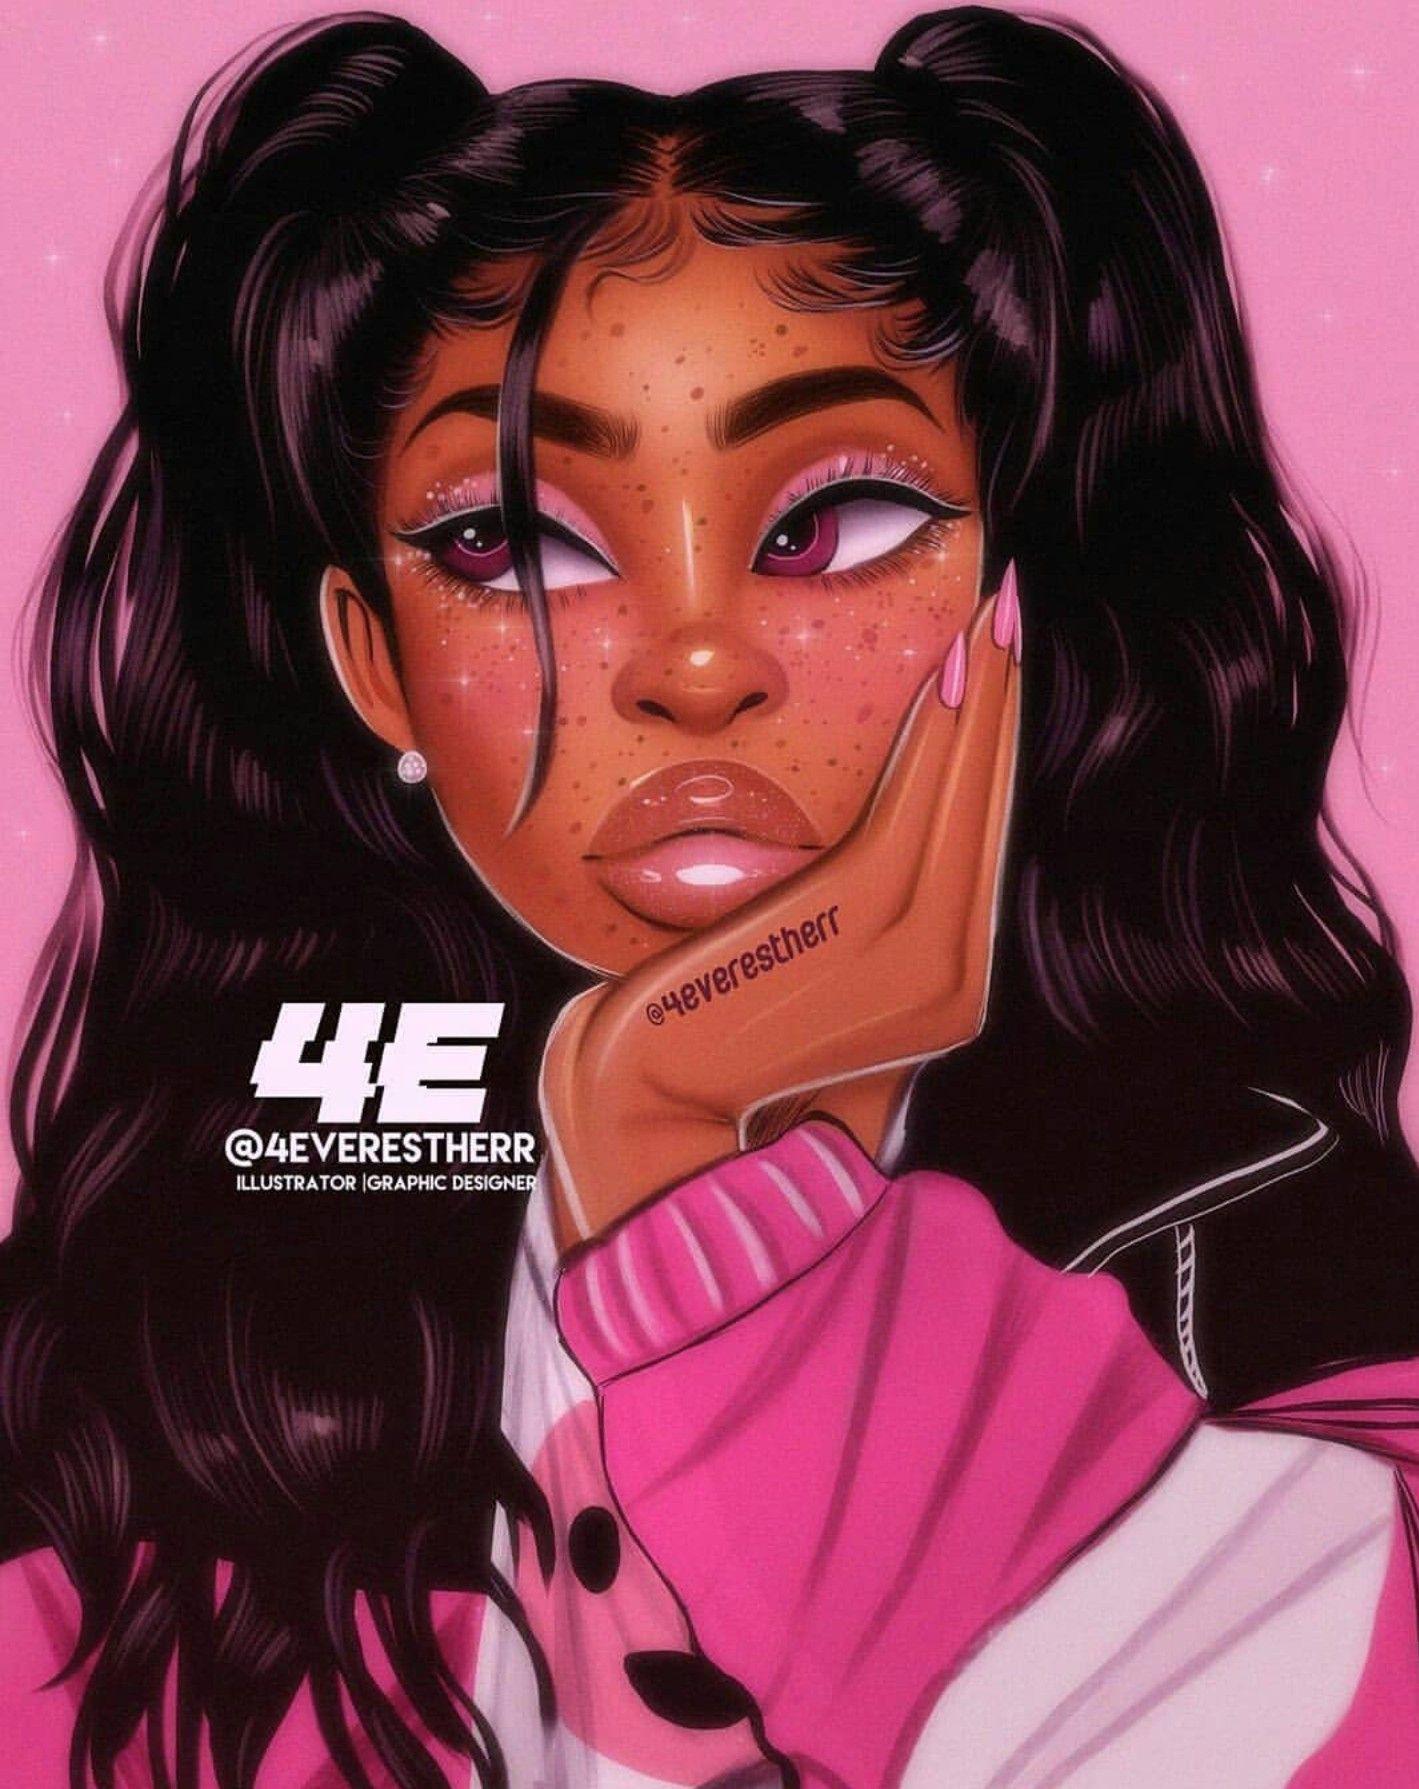 Black Girl Aesthetic Drawing : black, aesthetic, drawing, Black, Drawings, Wallpapers, Wallpaper